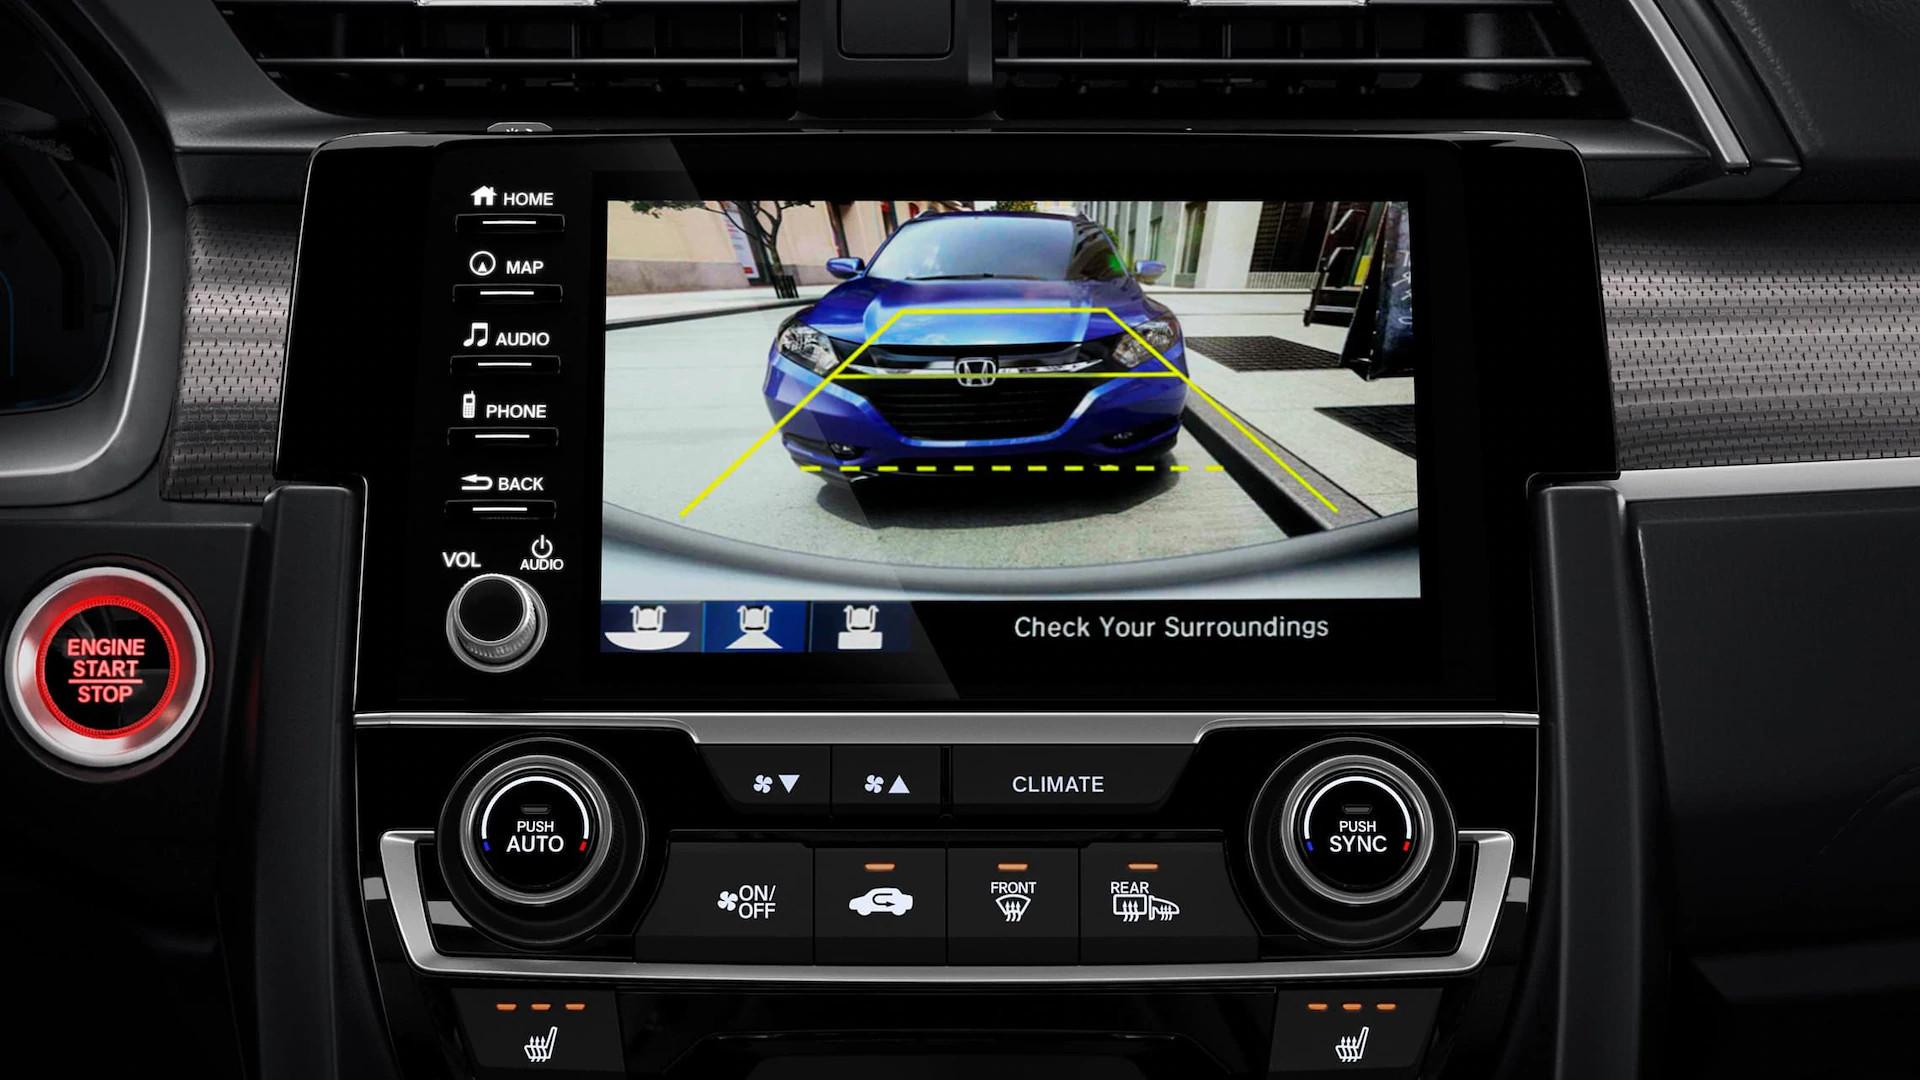 2020 Civic Multi-Angle Rearview Camera